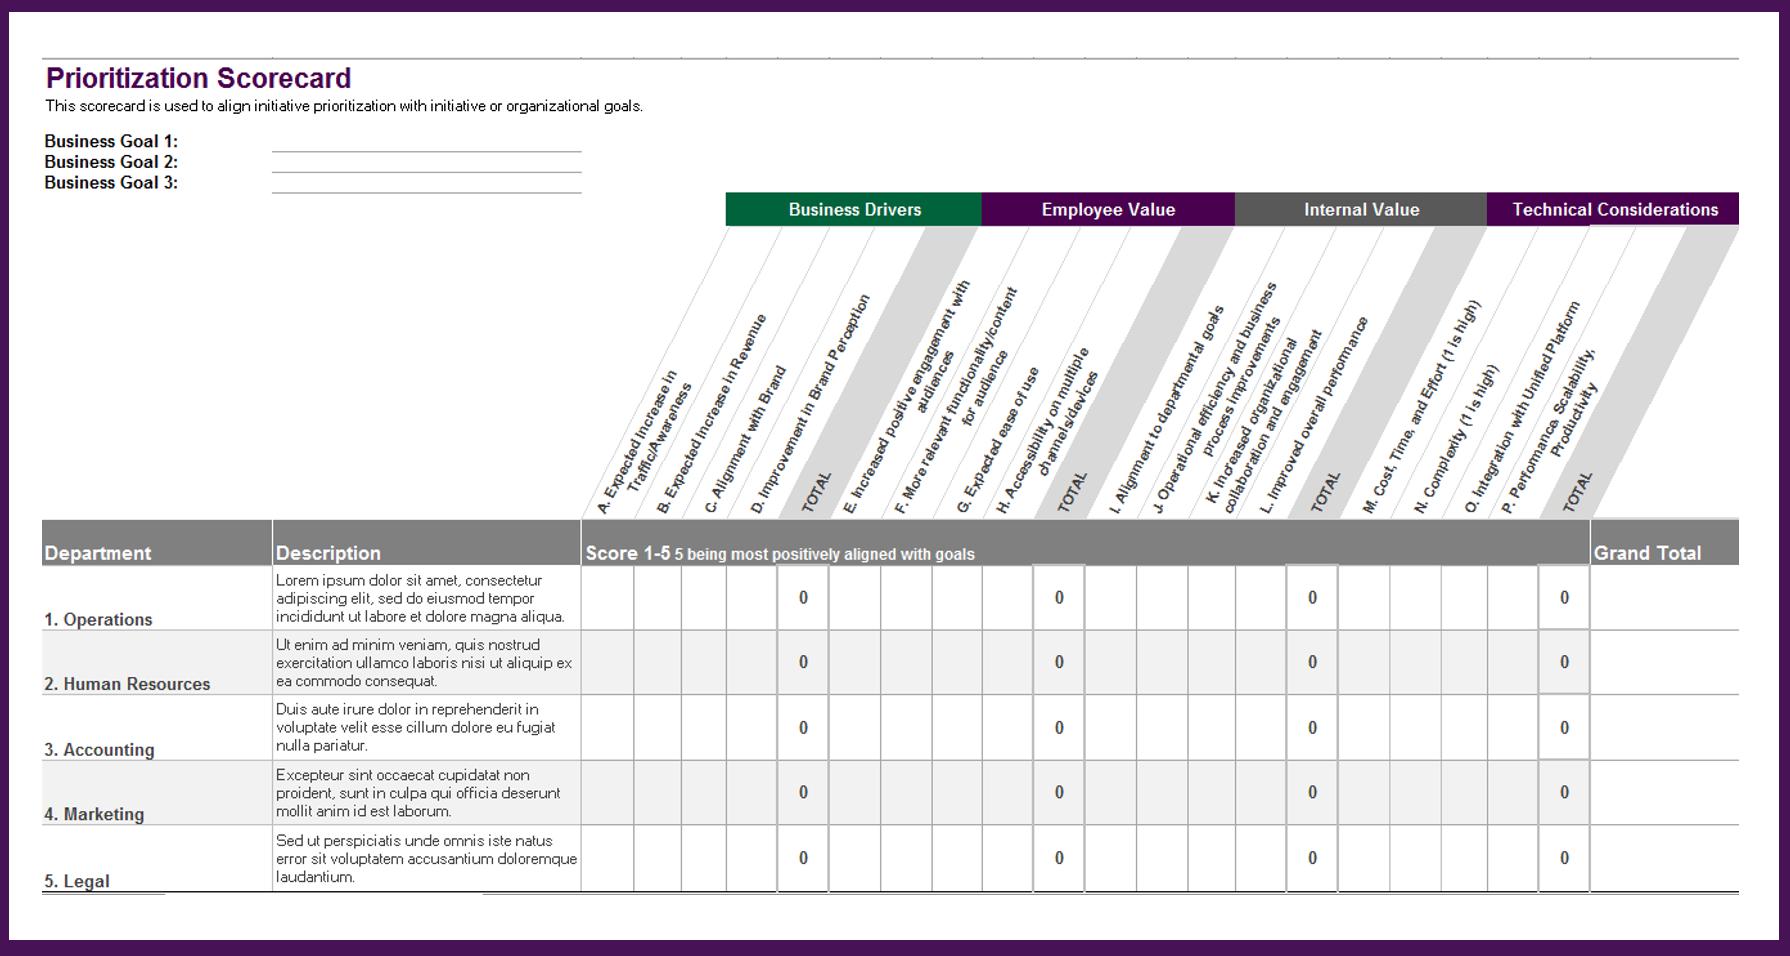 Prioritization Scorecard